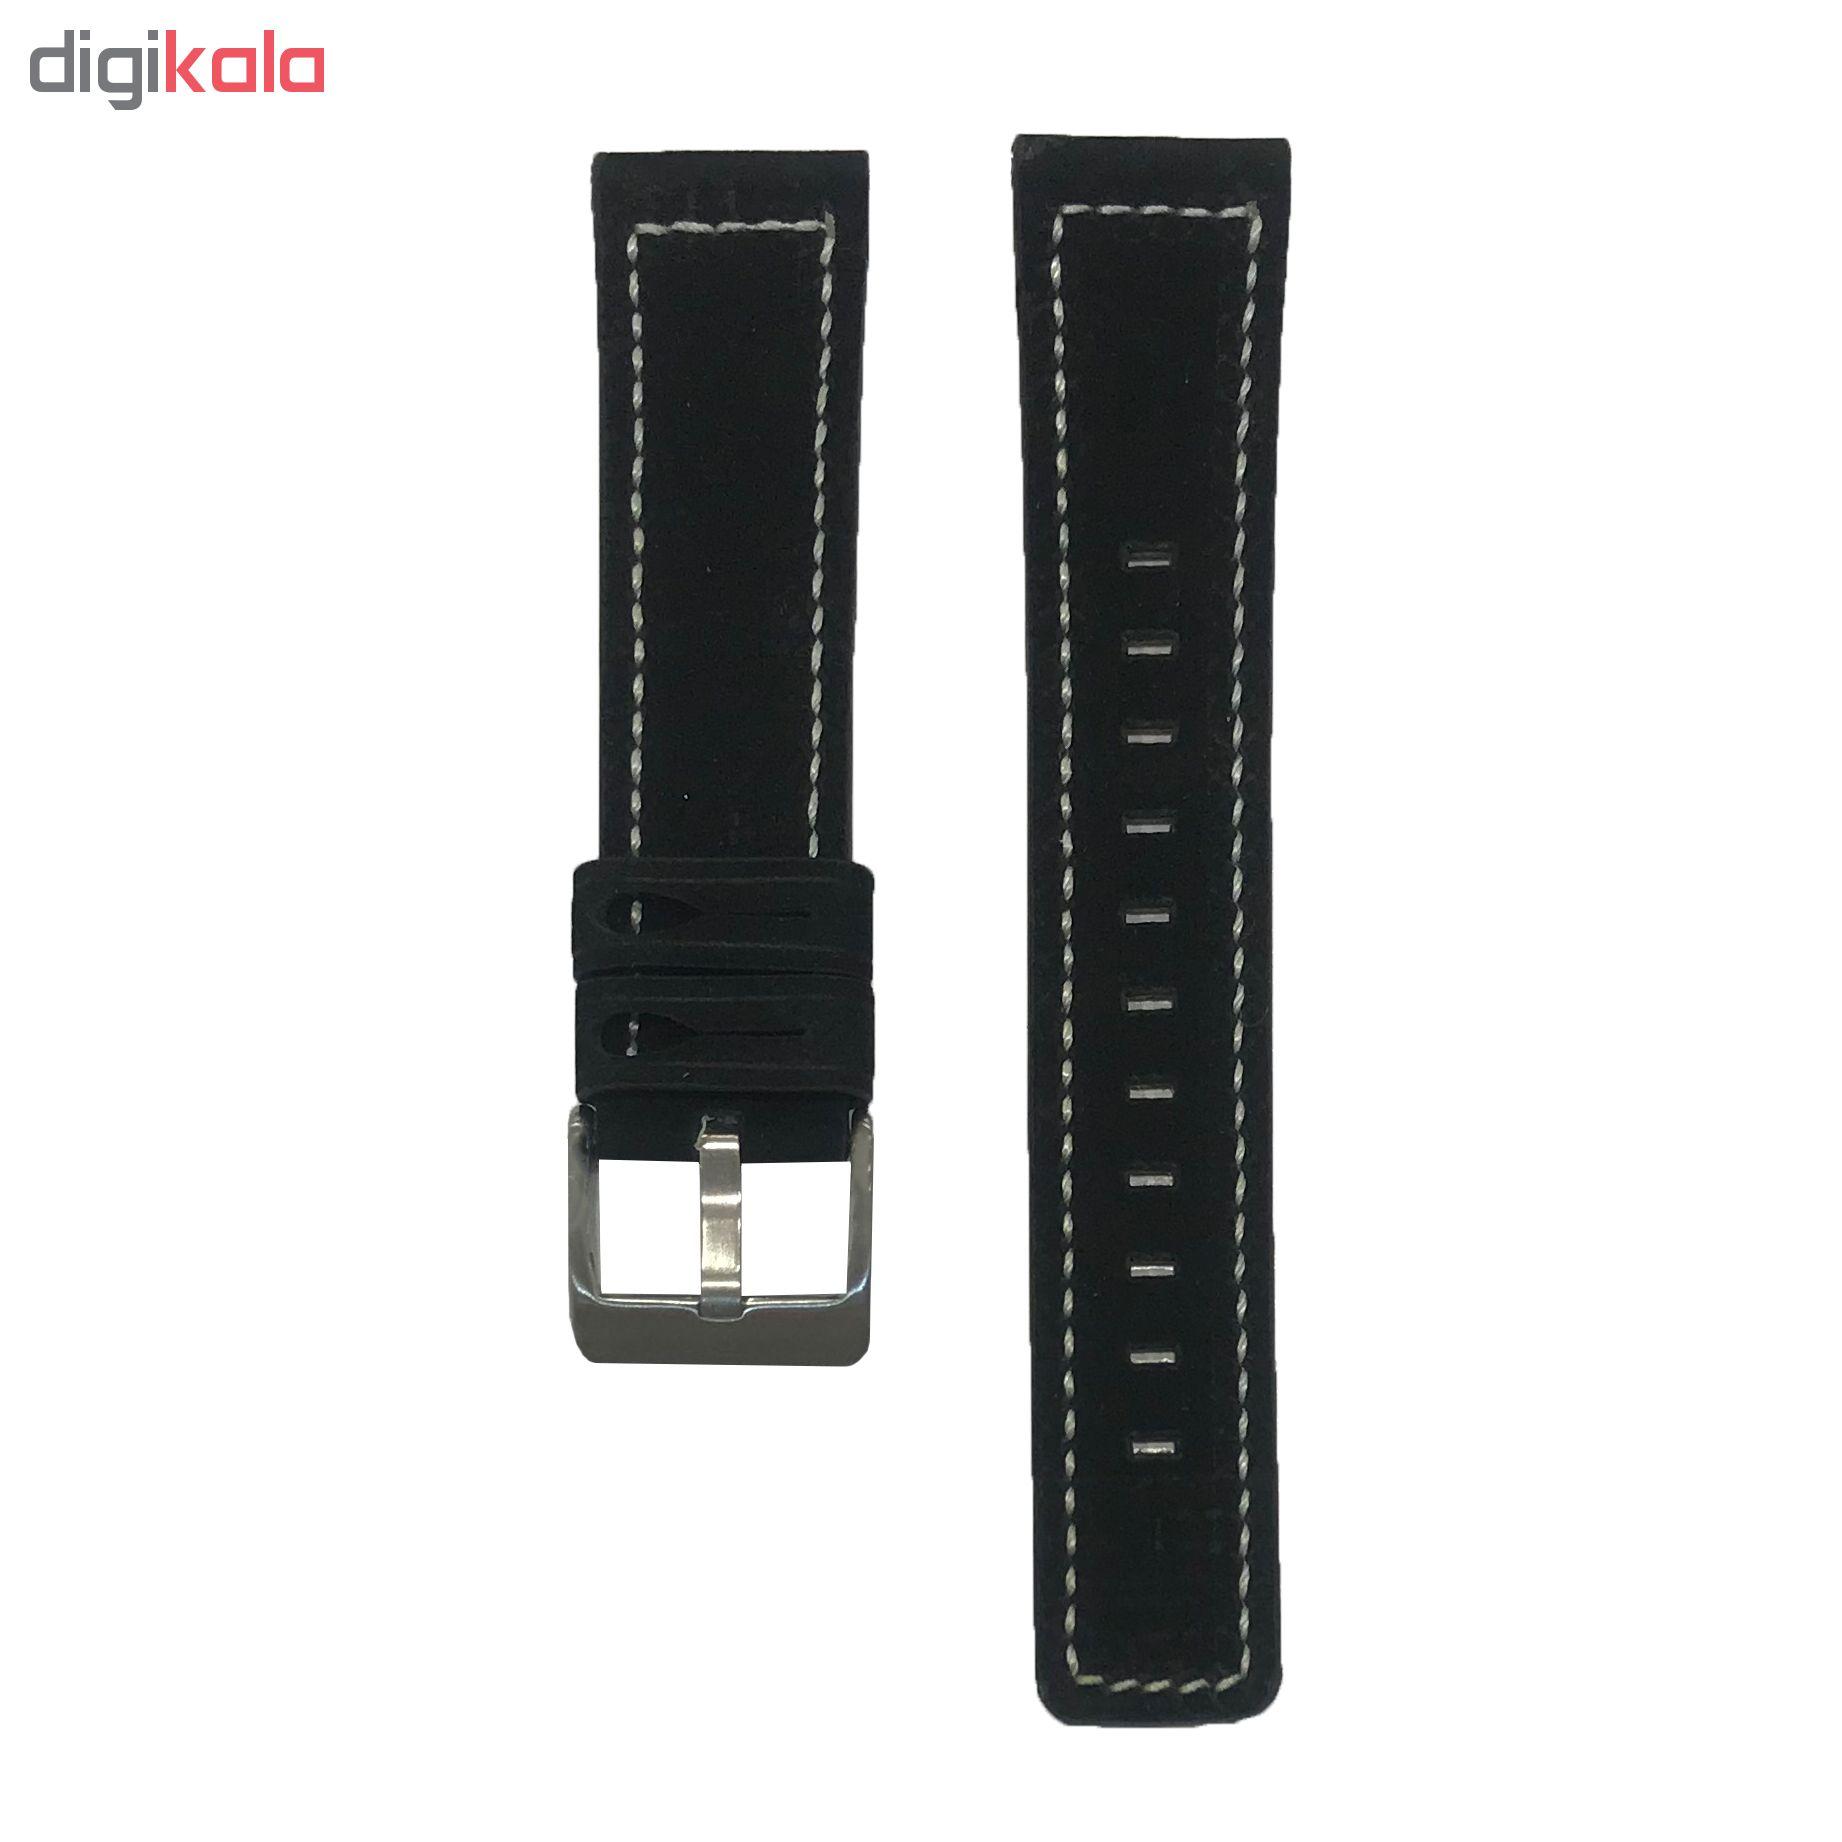 بند مدل CH-01 مناسب برای ساعت هوشمند سامسونگ Gear S2 Classic / Gear Sport / Galaxy Watch 42mm